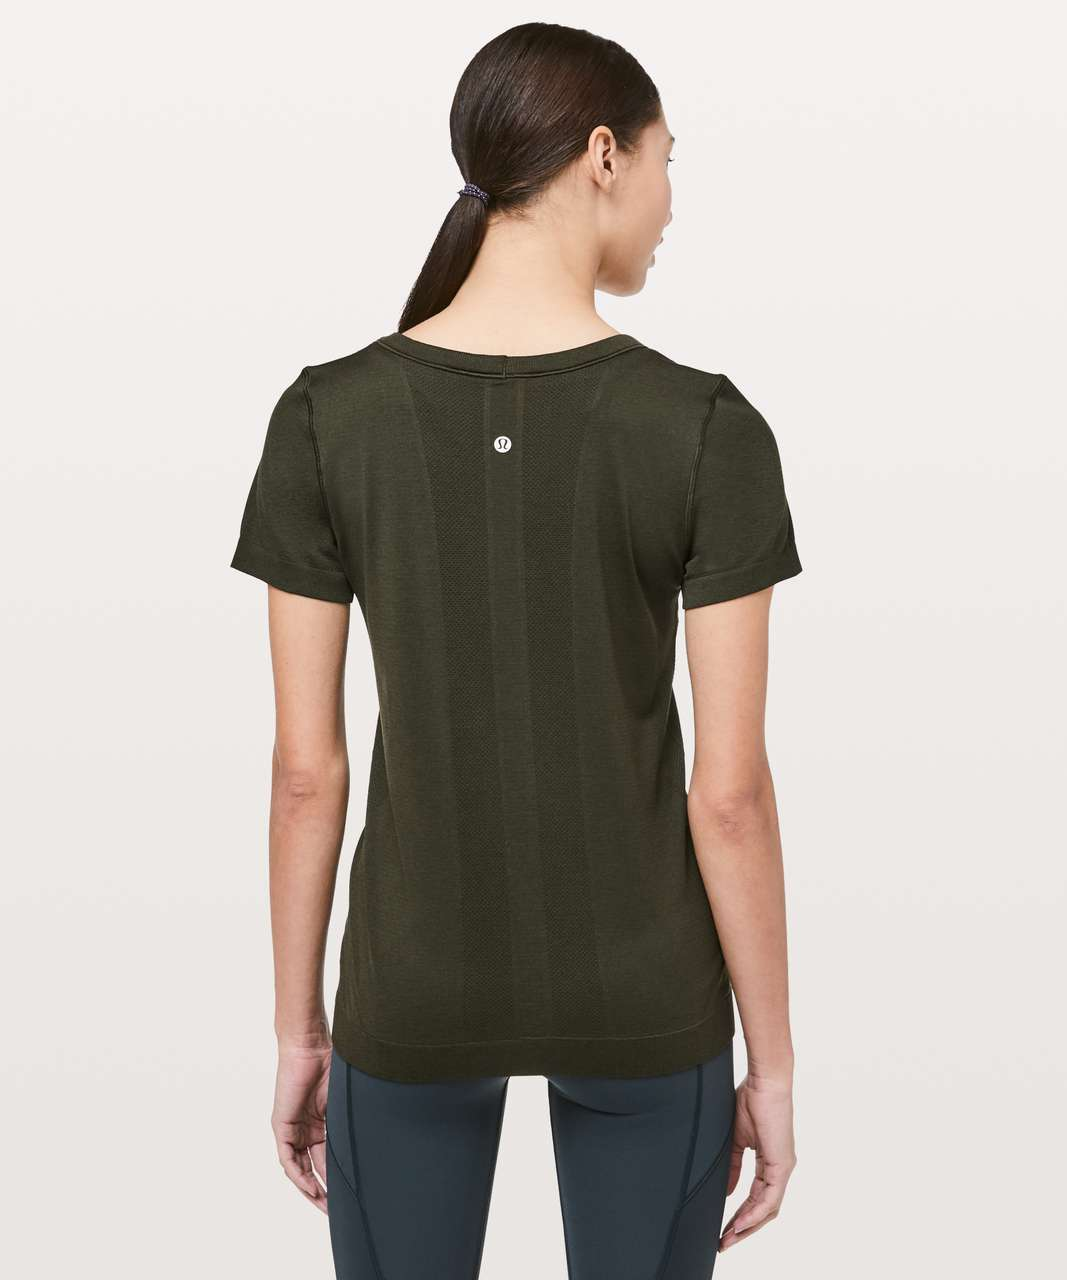 Lululemon Swiftly Tech Short Sleeve (Breeze) *Relaxed Fit - Dark Olive / Dark Olive